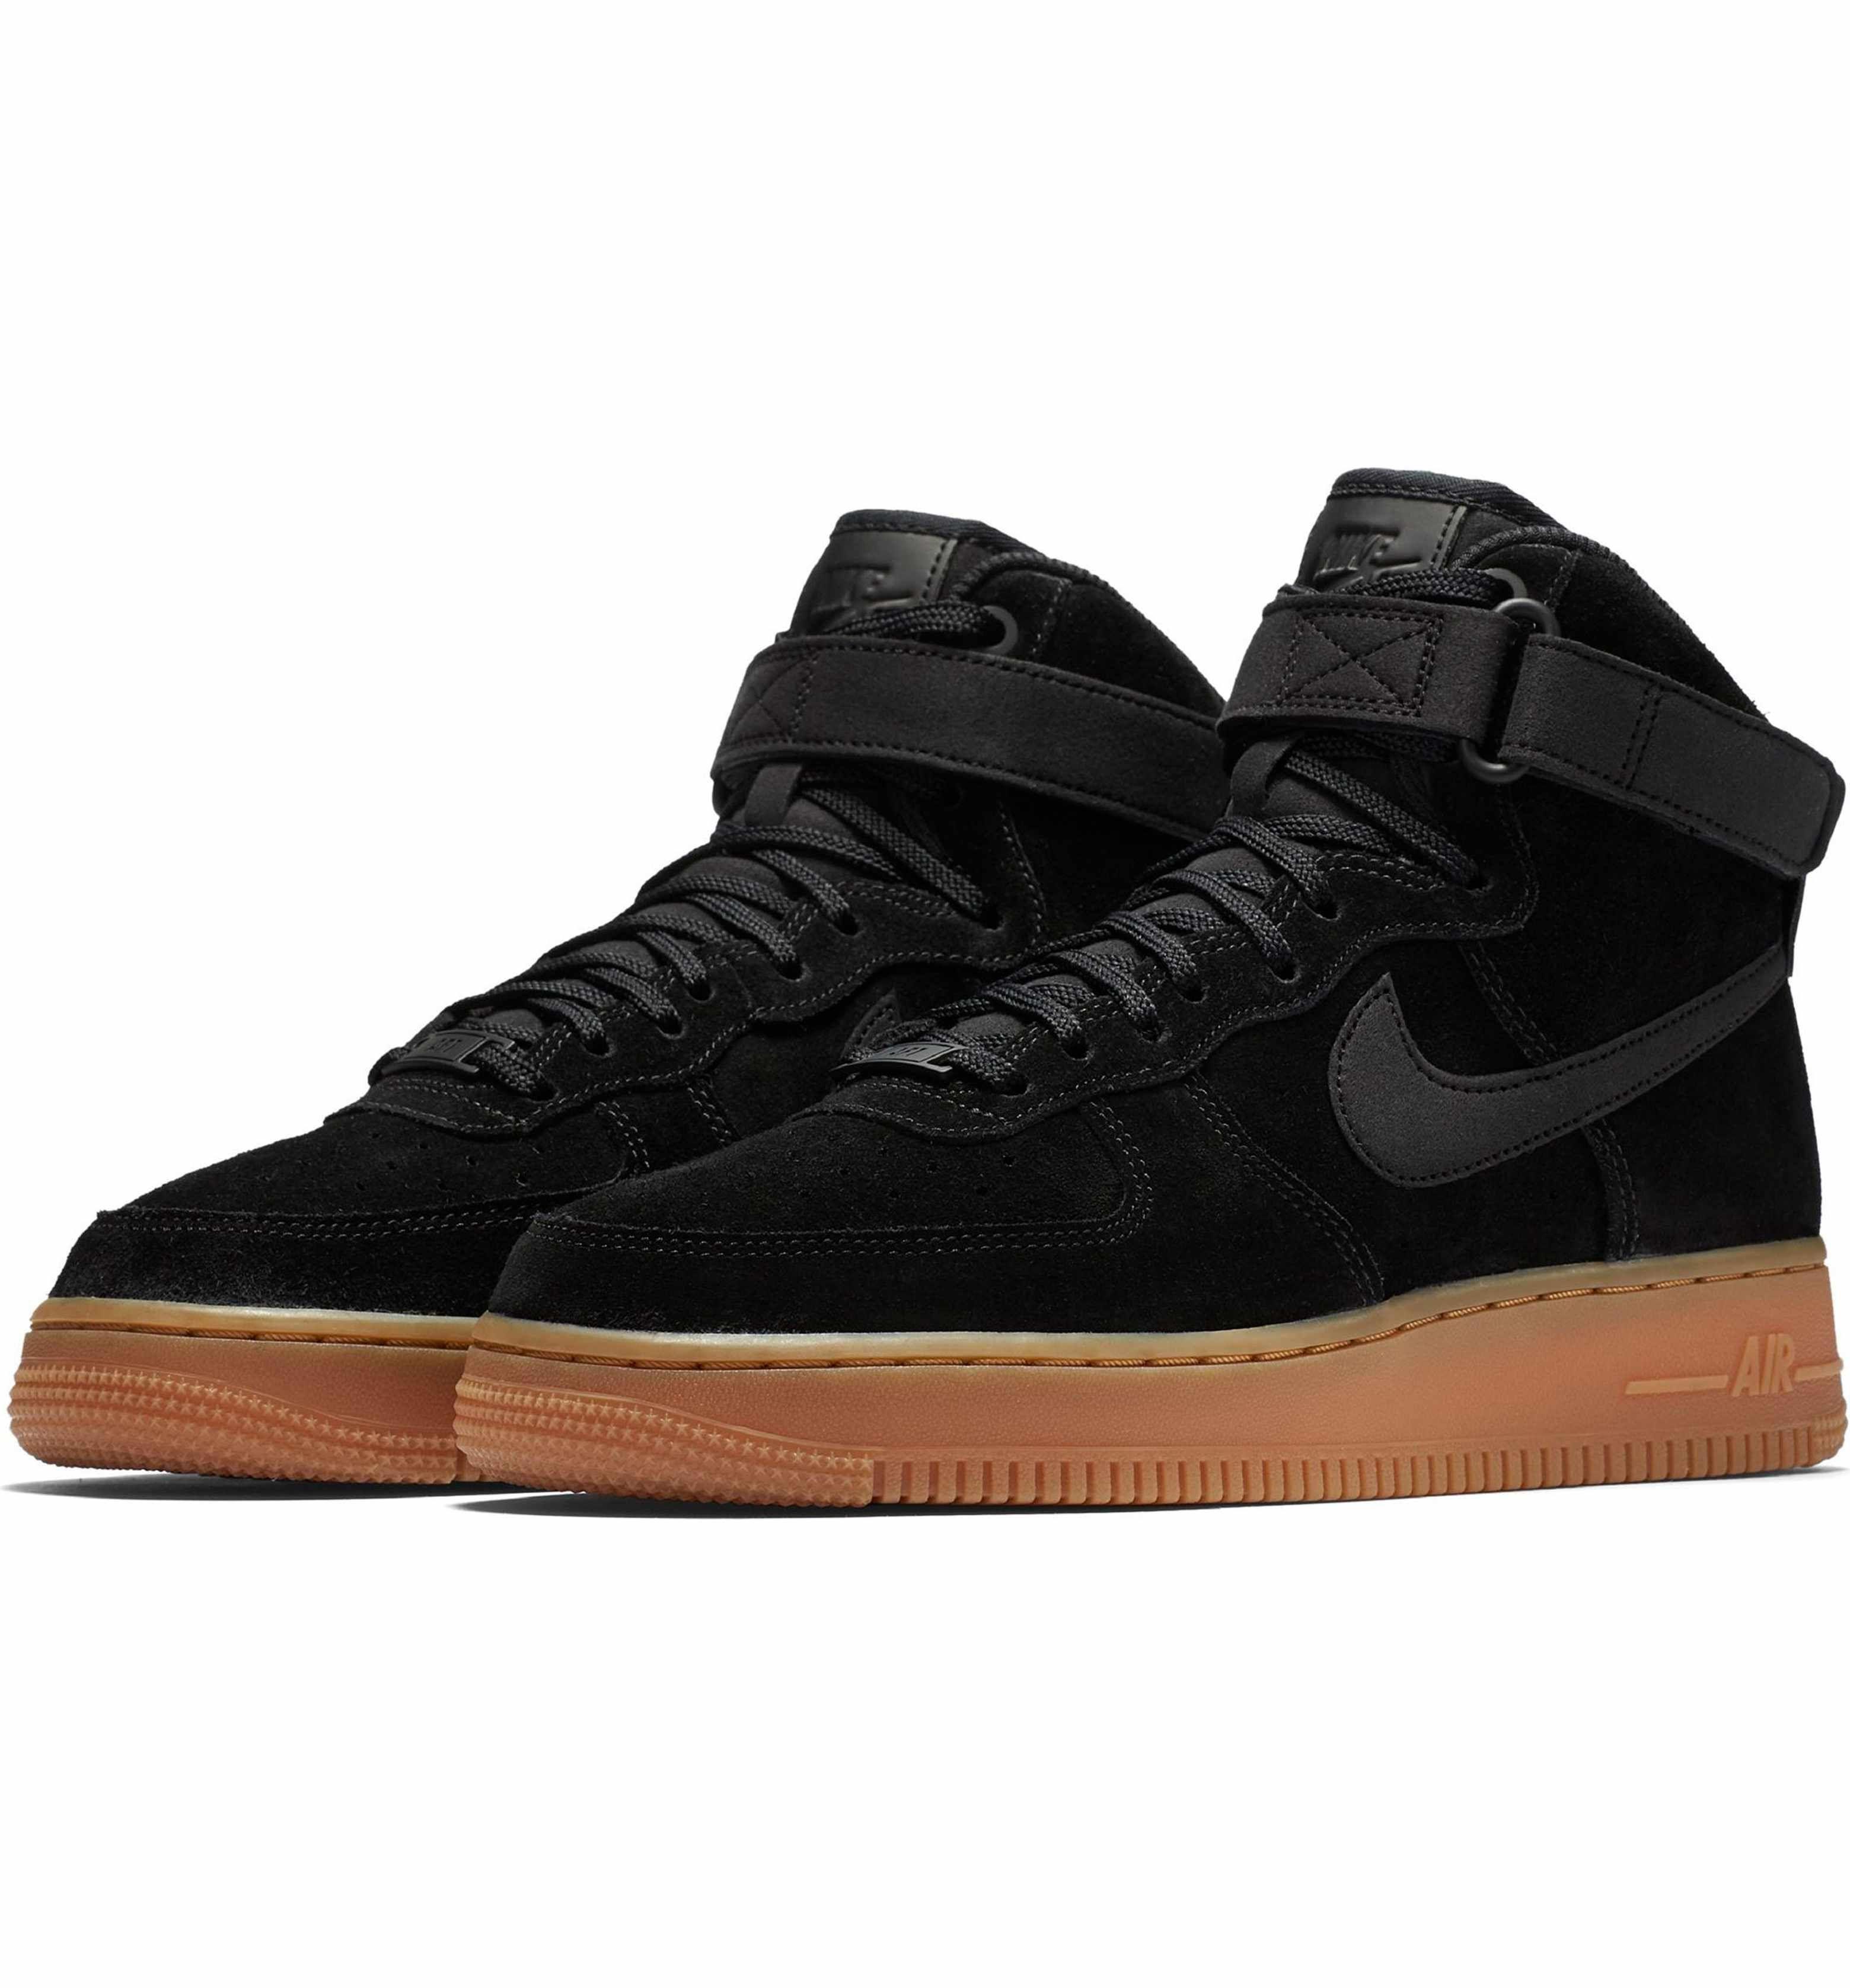 48ac39adf192 Main Image - Nike Air Force 1 High Top SE Sneaker (Women)